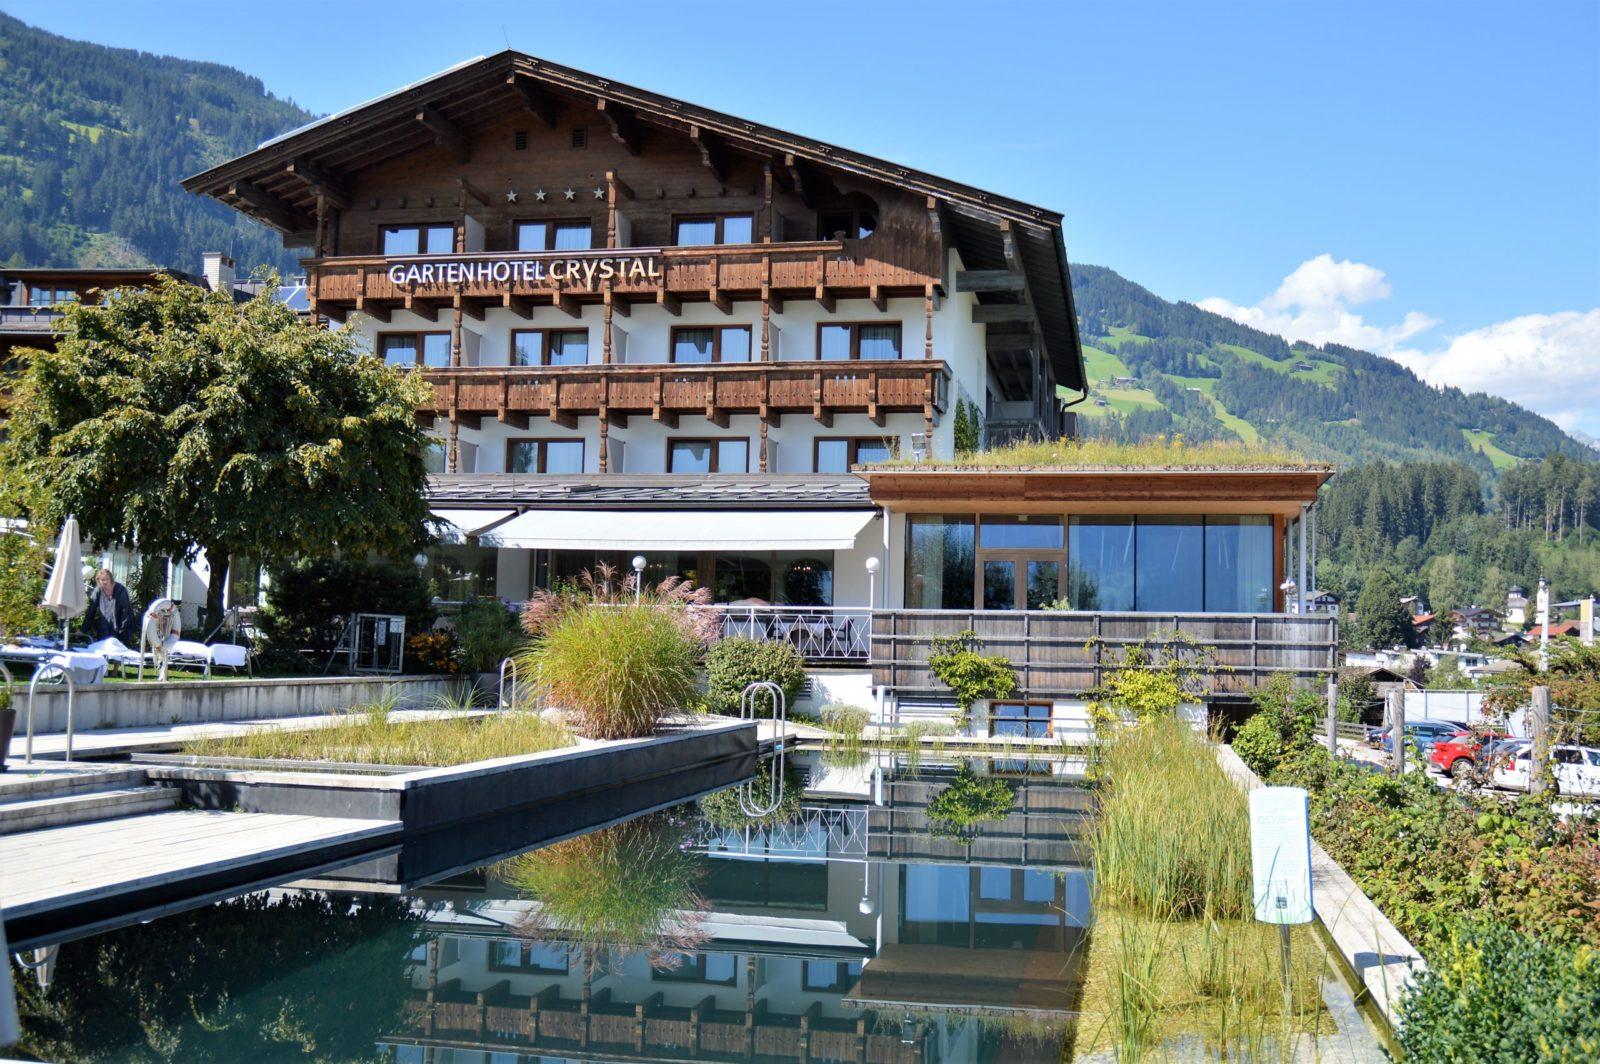 Gartenhotel Crystal in Fügen in Tirol